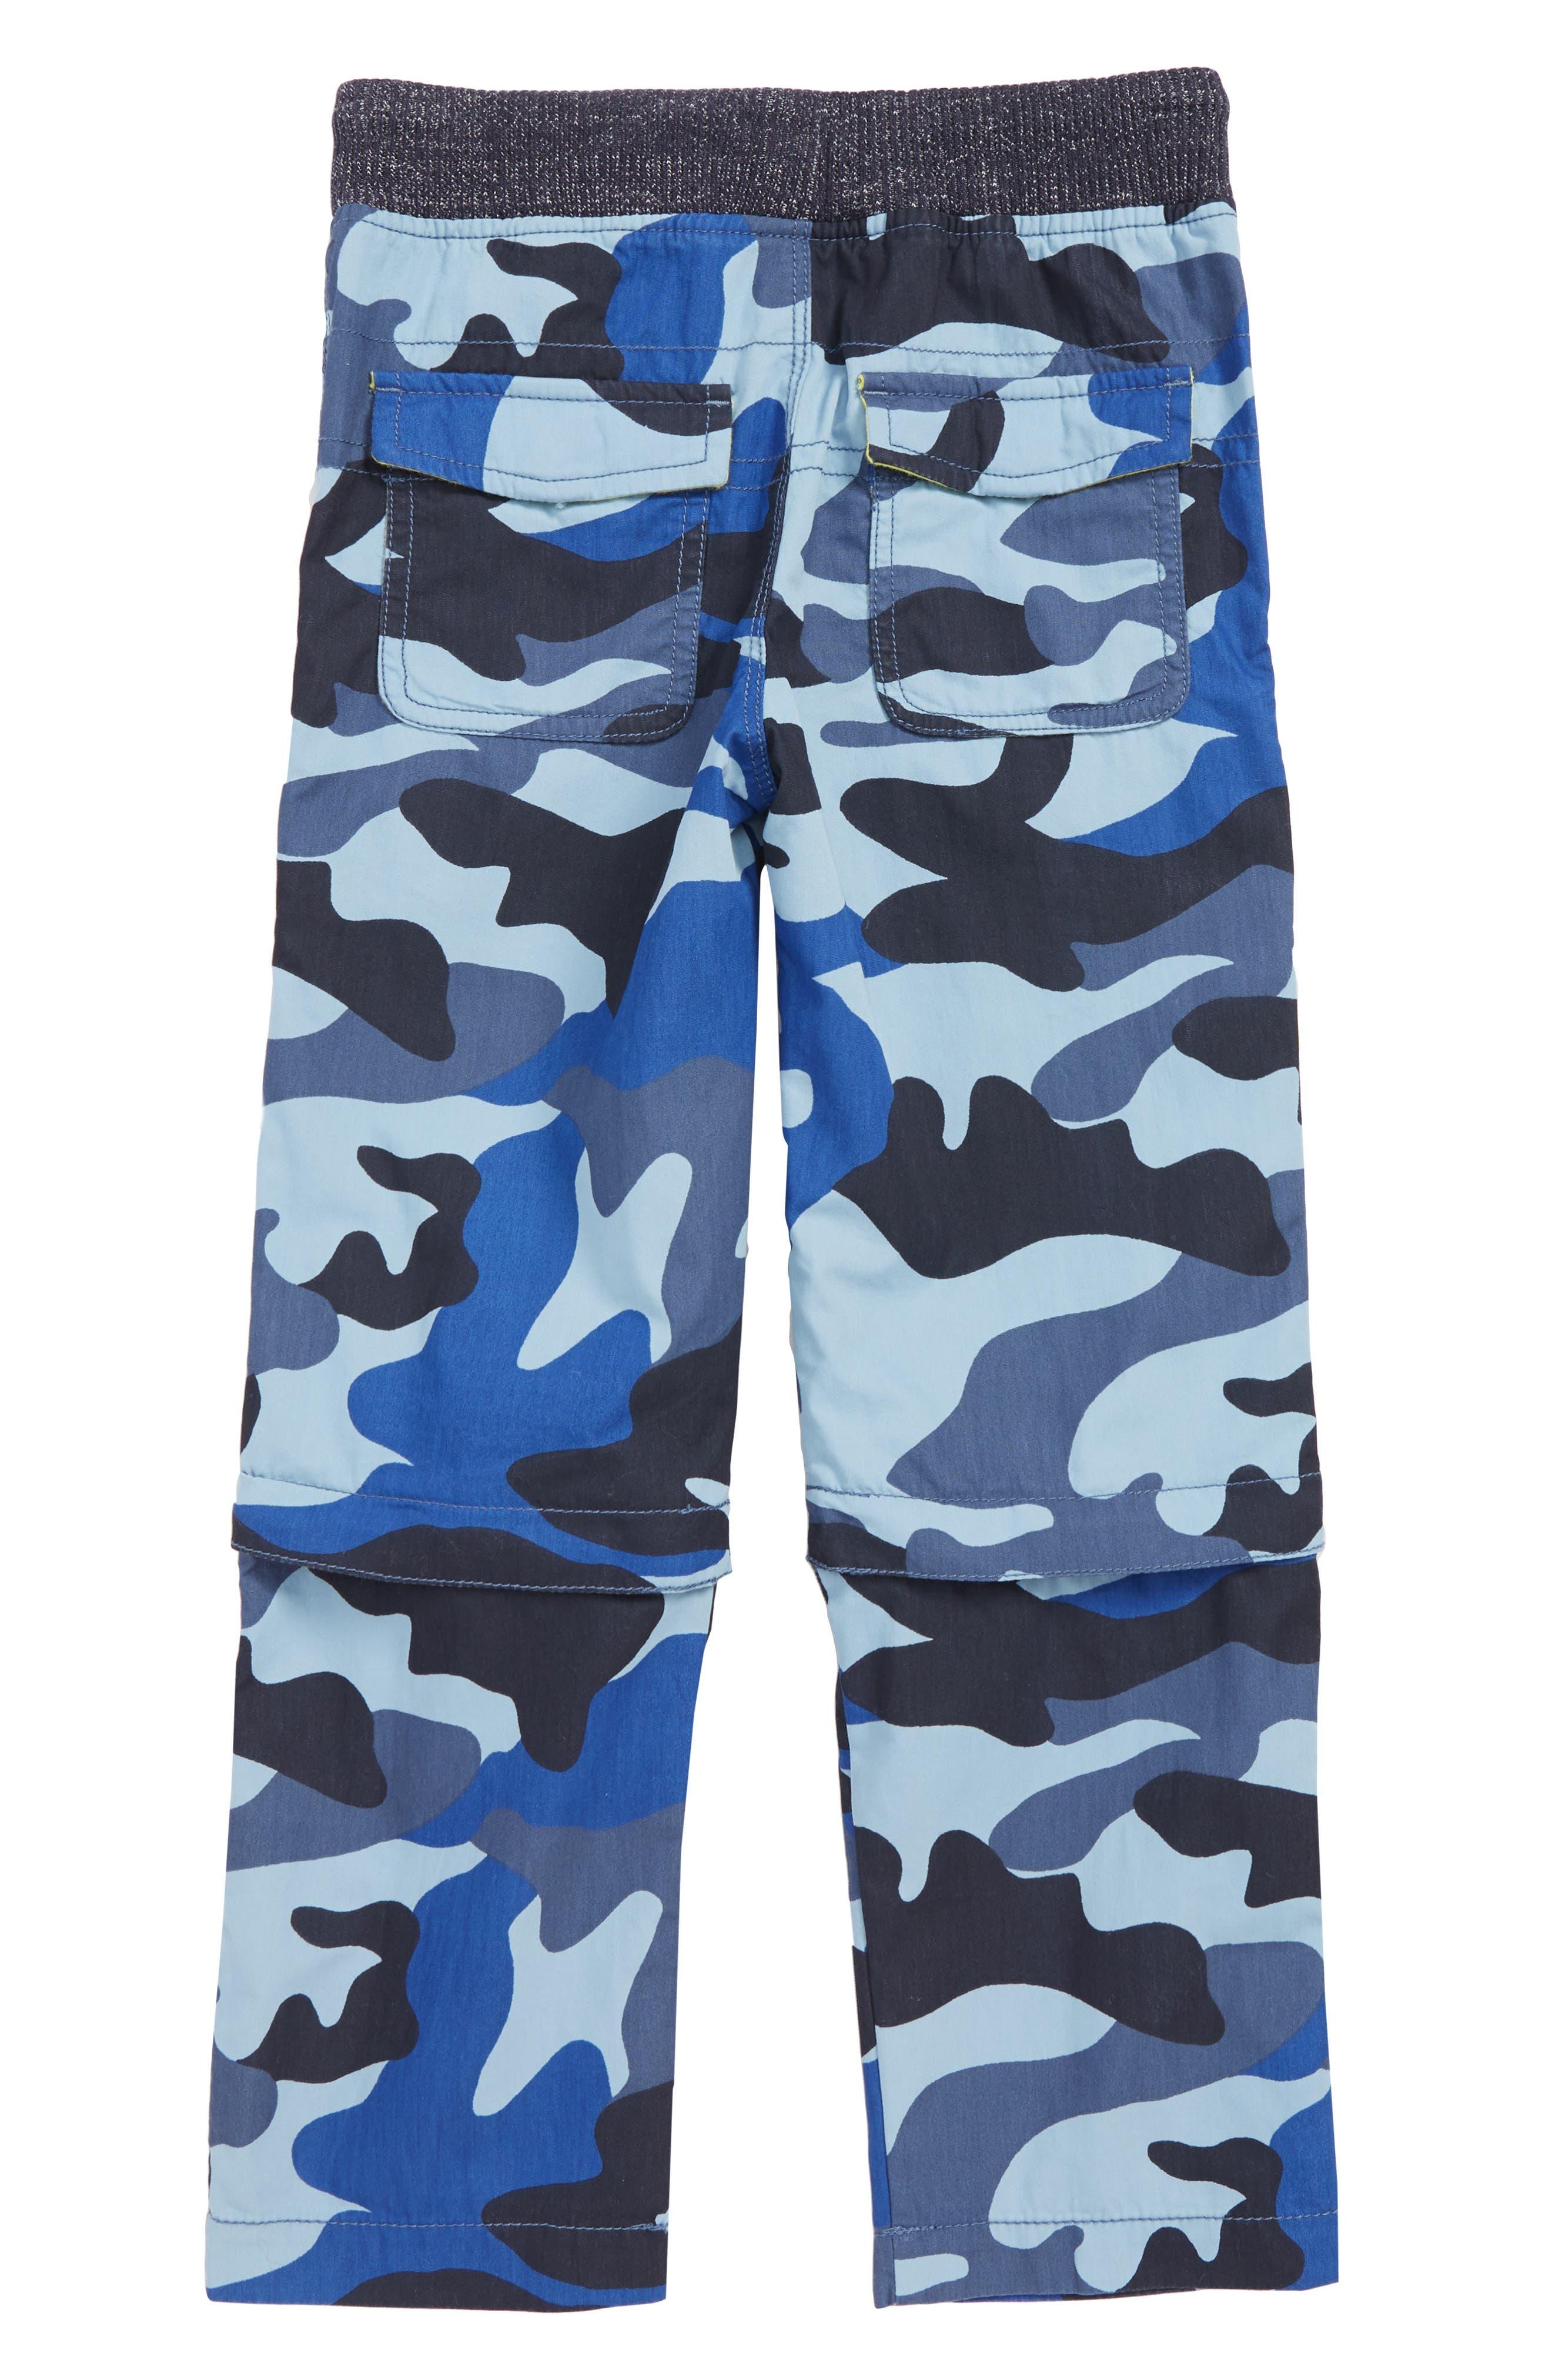 Techno Convertible Zip Off Pants,                             Alternate thumbnail 2, color,                             COLLEGE BLUE CAMO